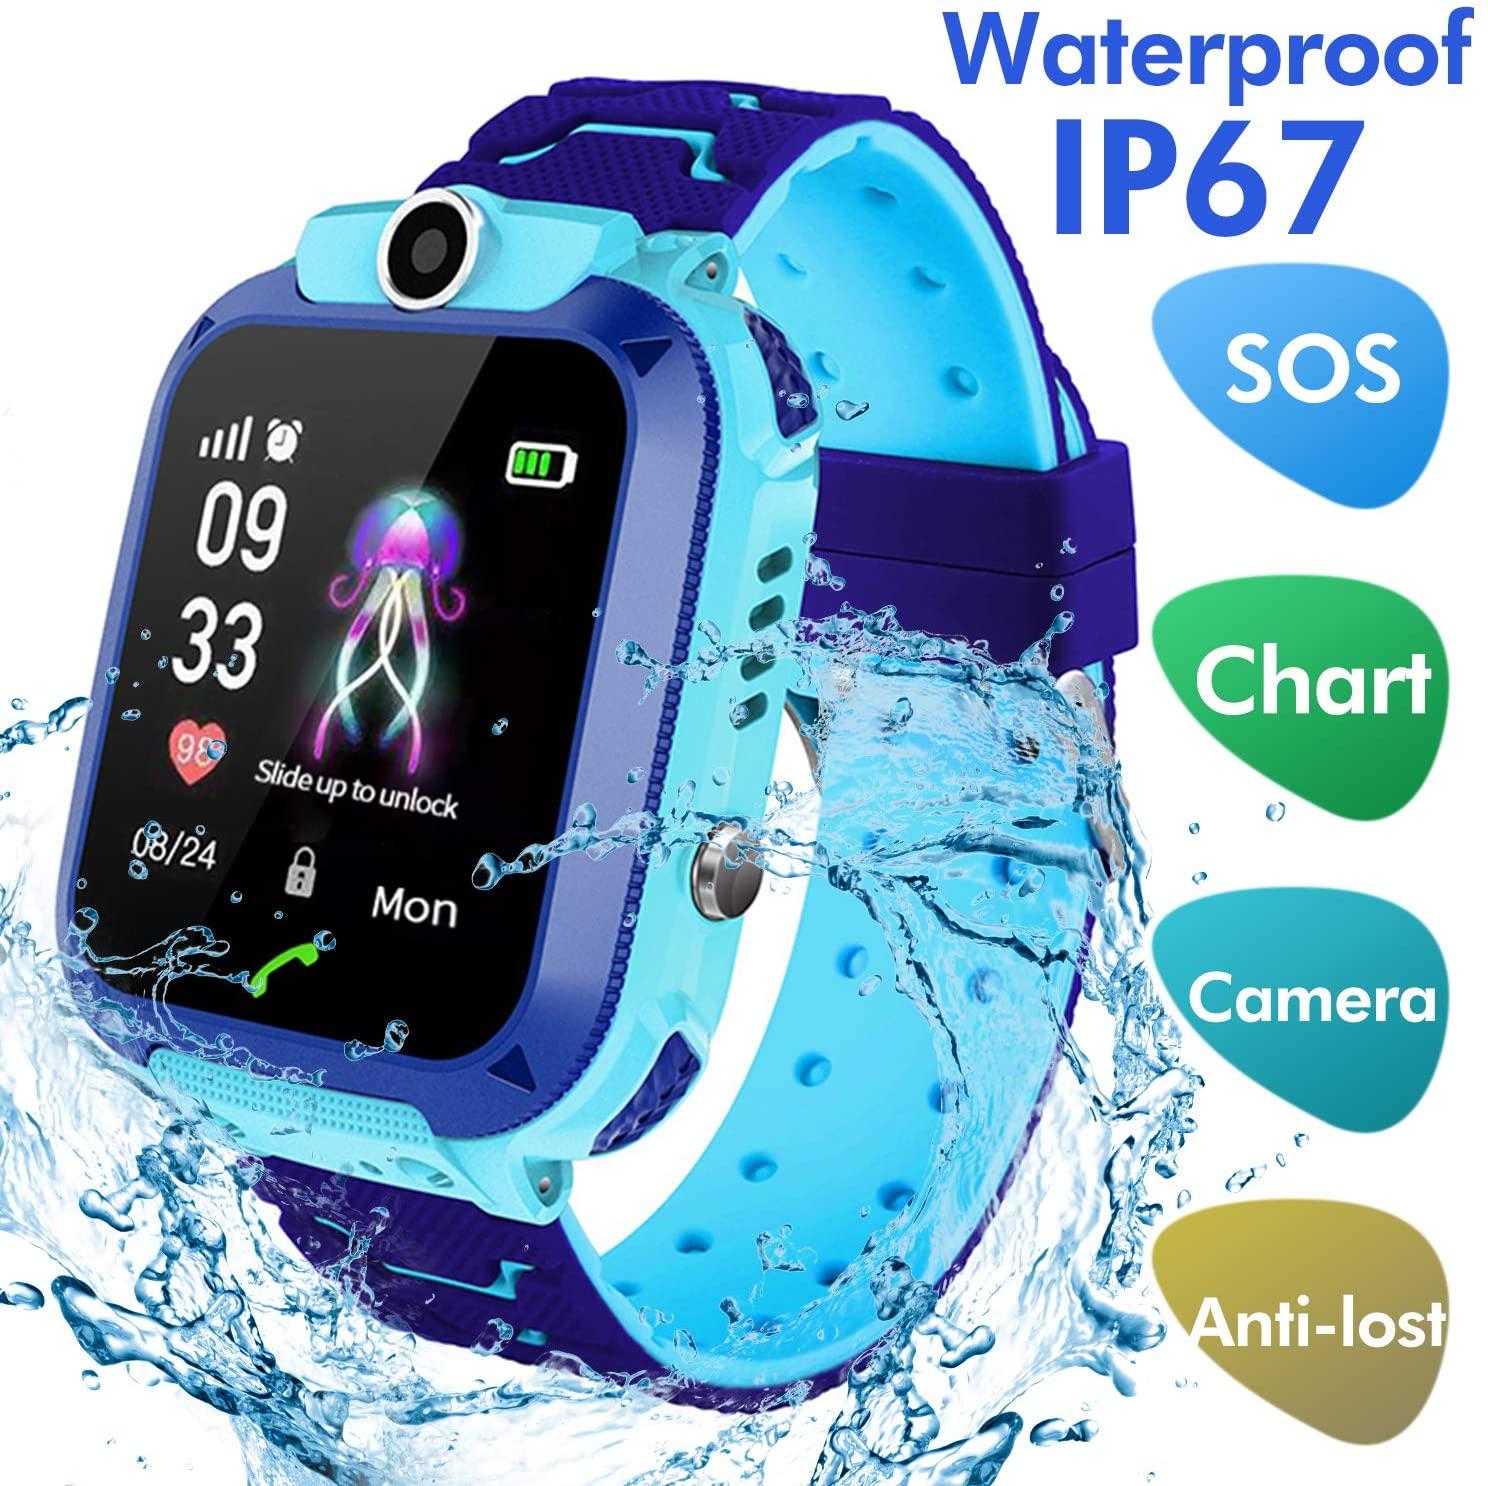 Jaybest Smartwatch Niños - Inteligente Relojes Phone con cámara SOS Ranura para Tarjeta de Juego Juego de Reloj Inteligente Compatible con iOS y Android(Azul púrpura)